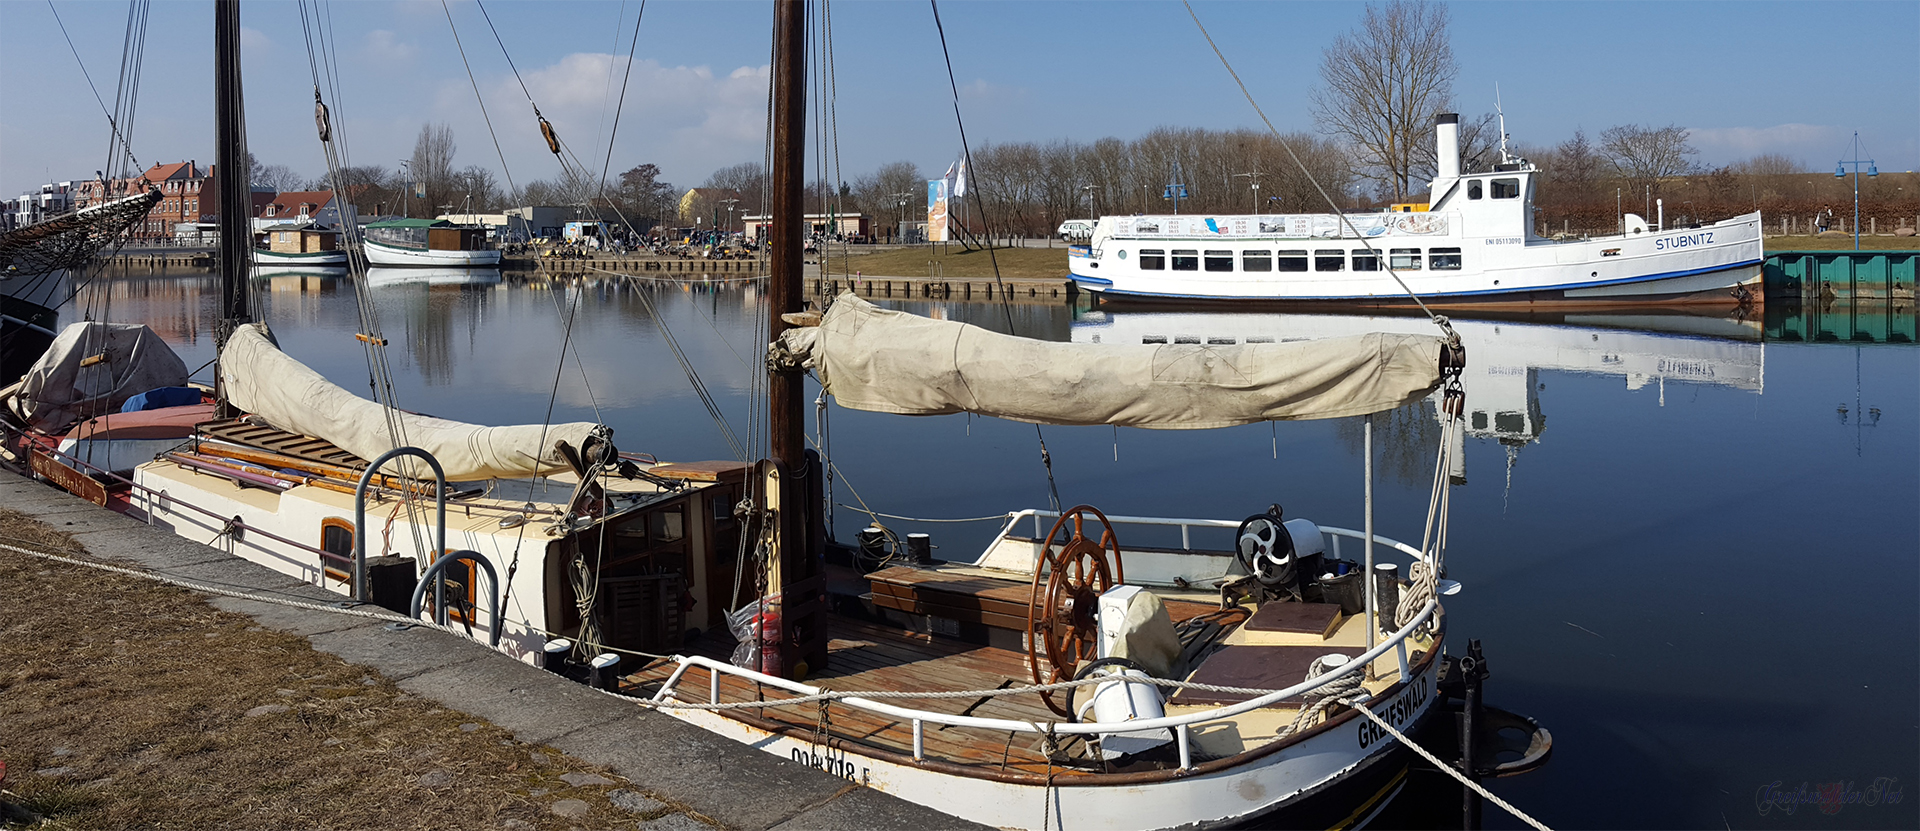 Frühlings-Sonntag am Museumshafen in Greifswald